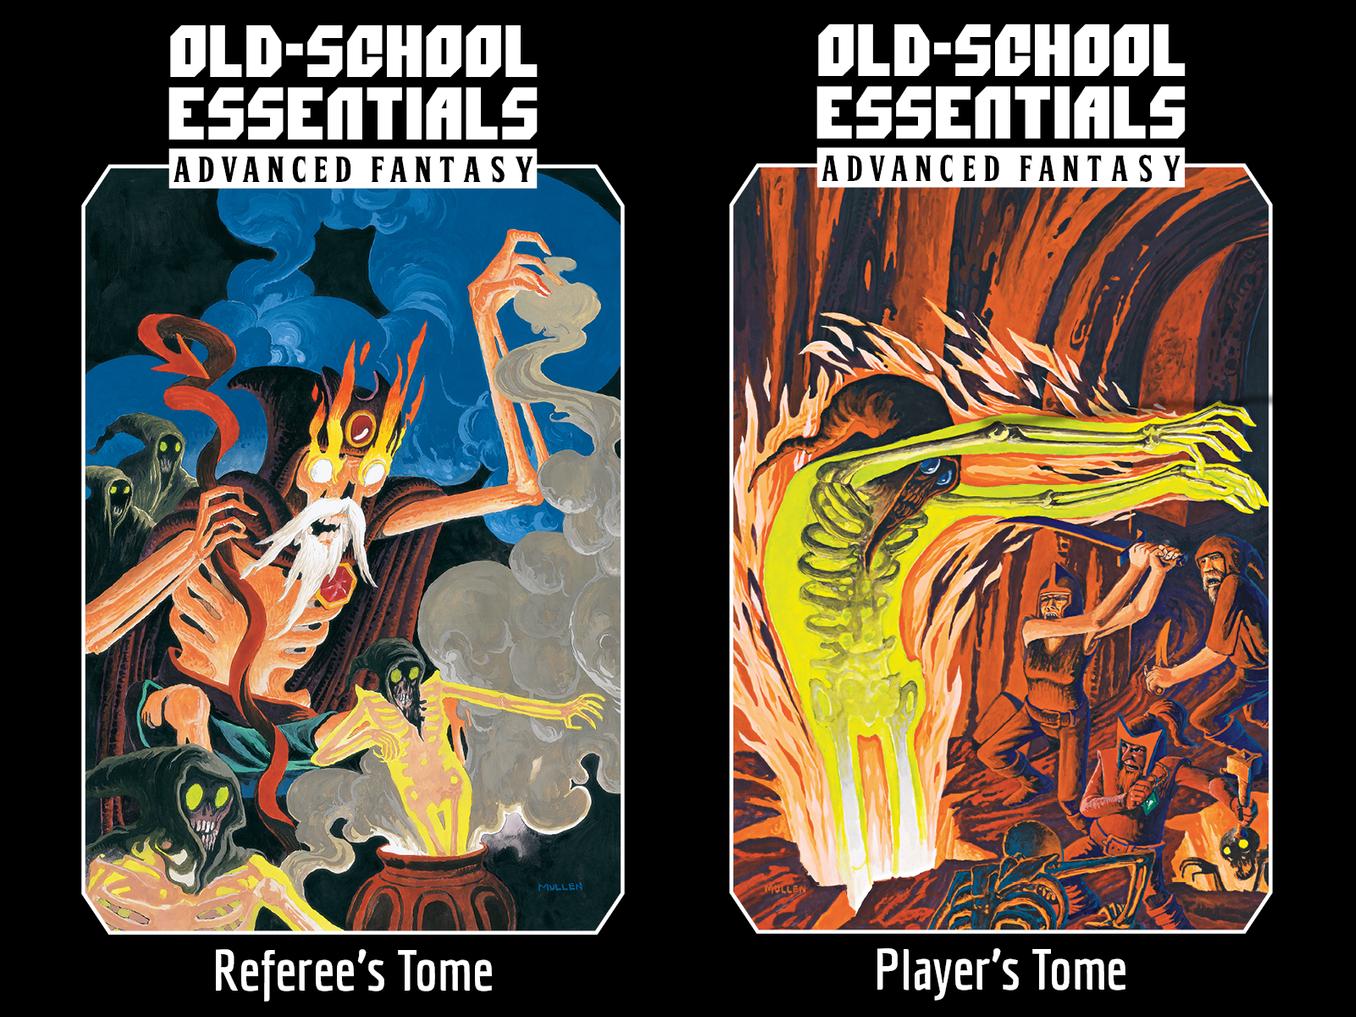 Análisis - Old-School Essentials Advanced Fantasy